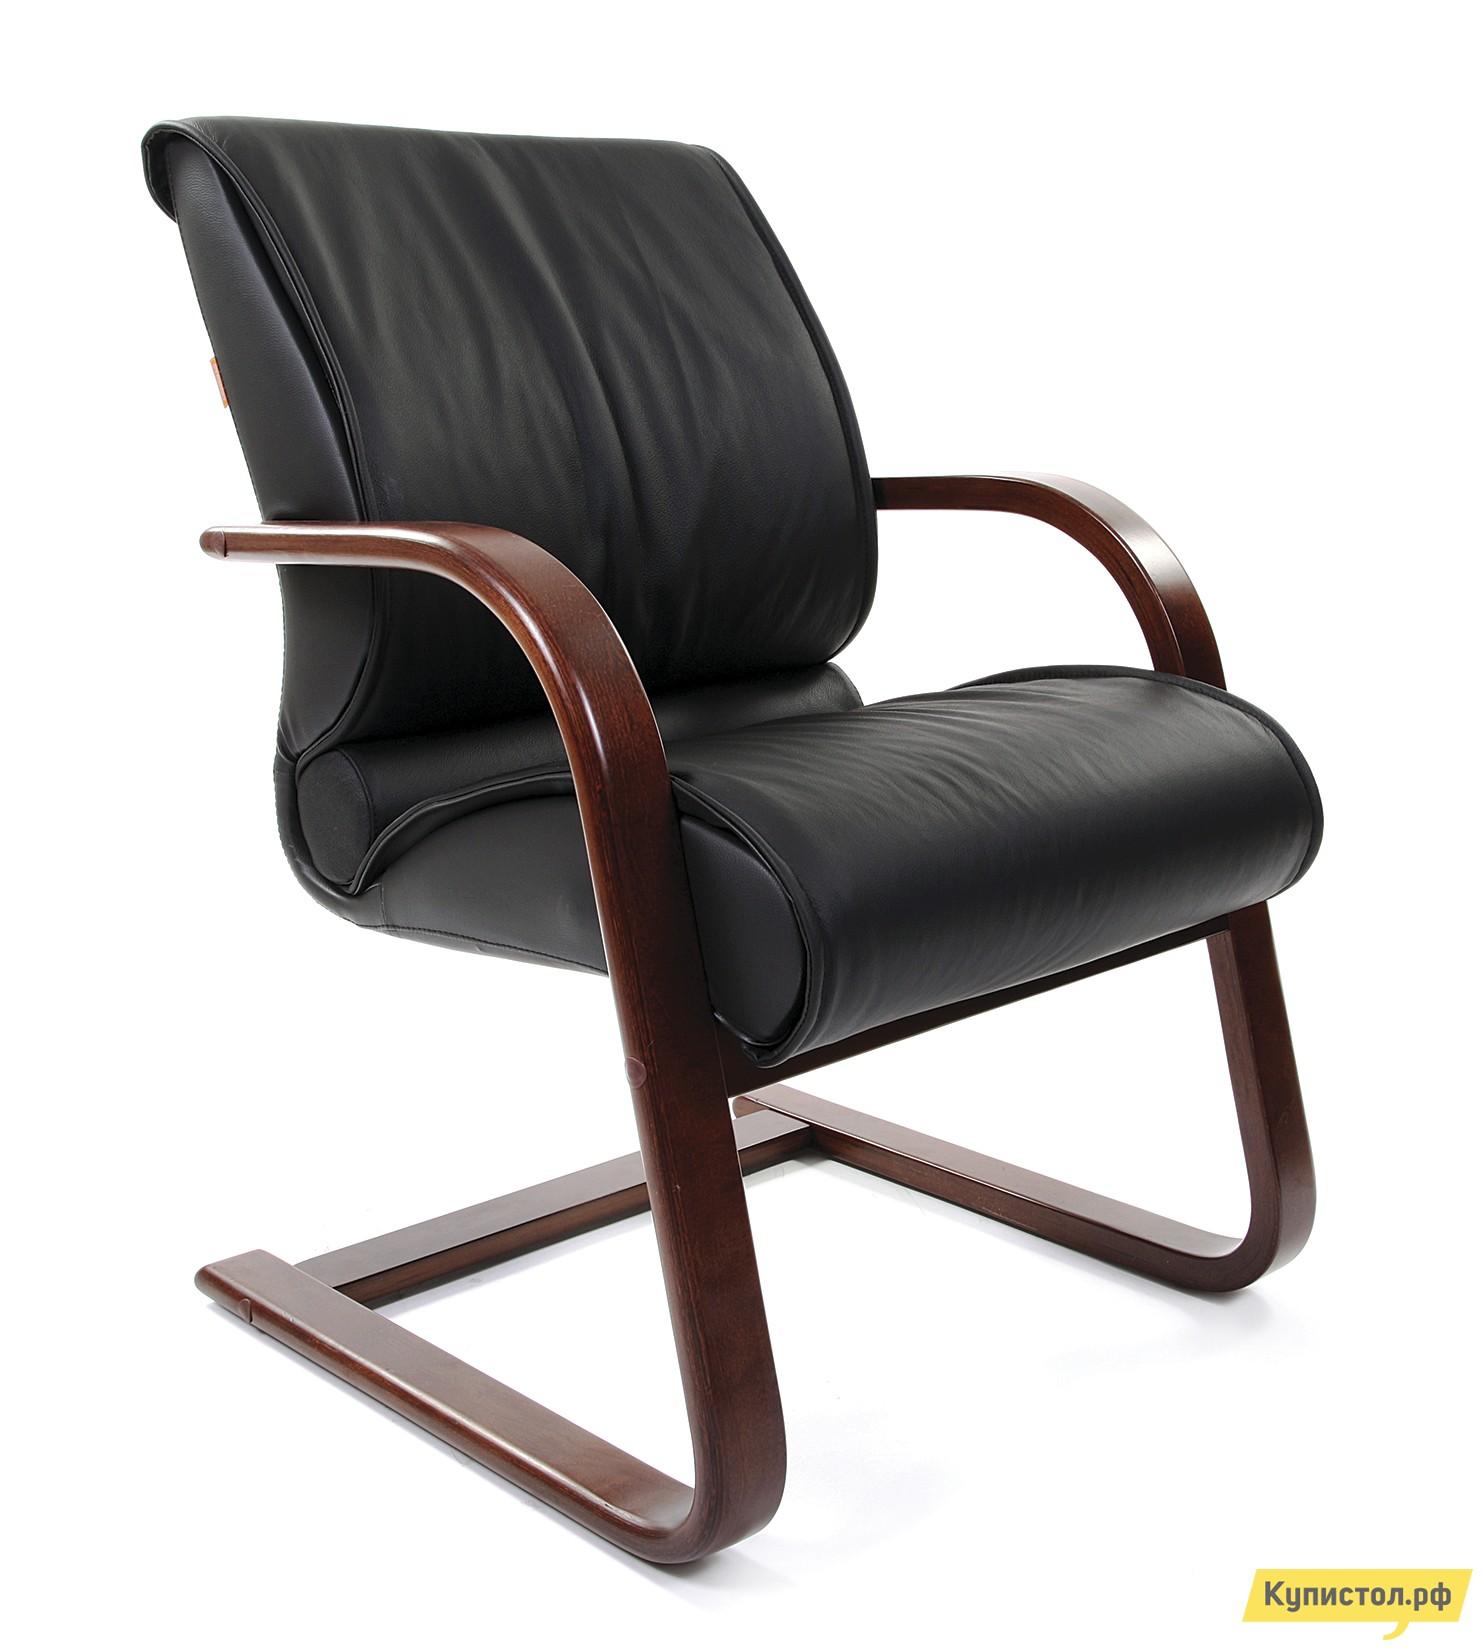 Офисный стул Chairman CHAIRMAN 445 WD Черная кожа